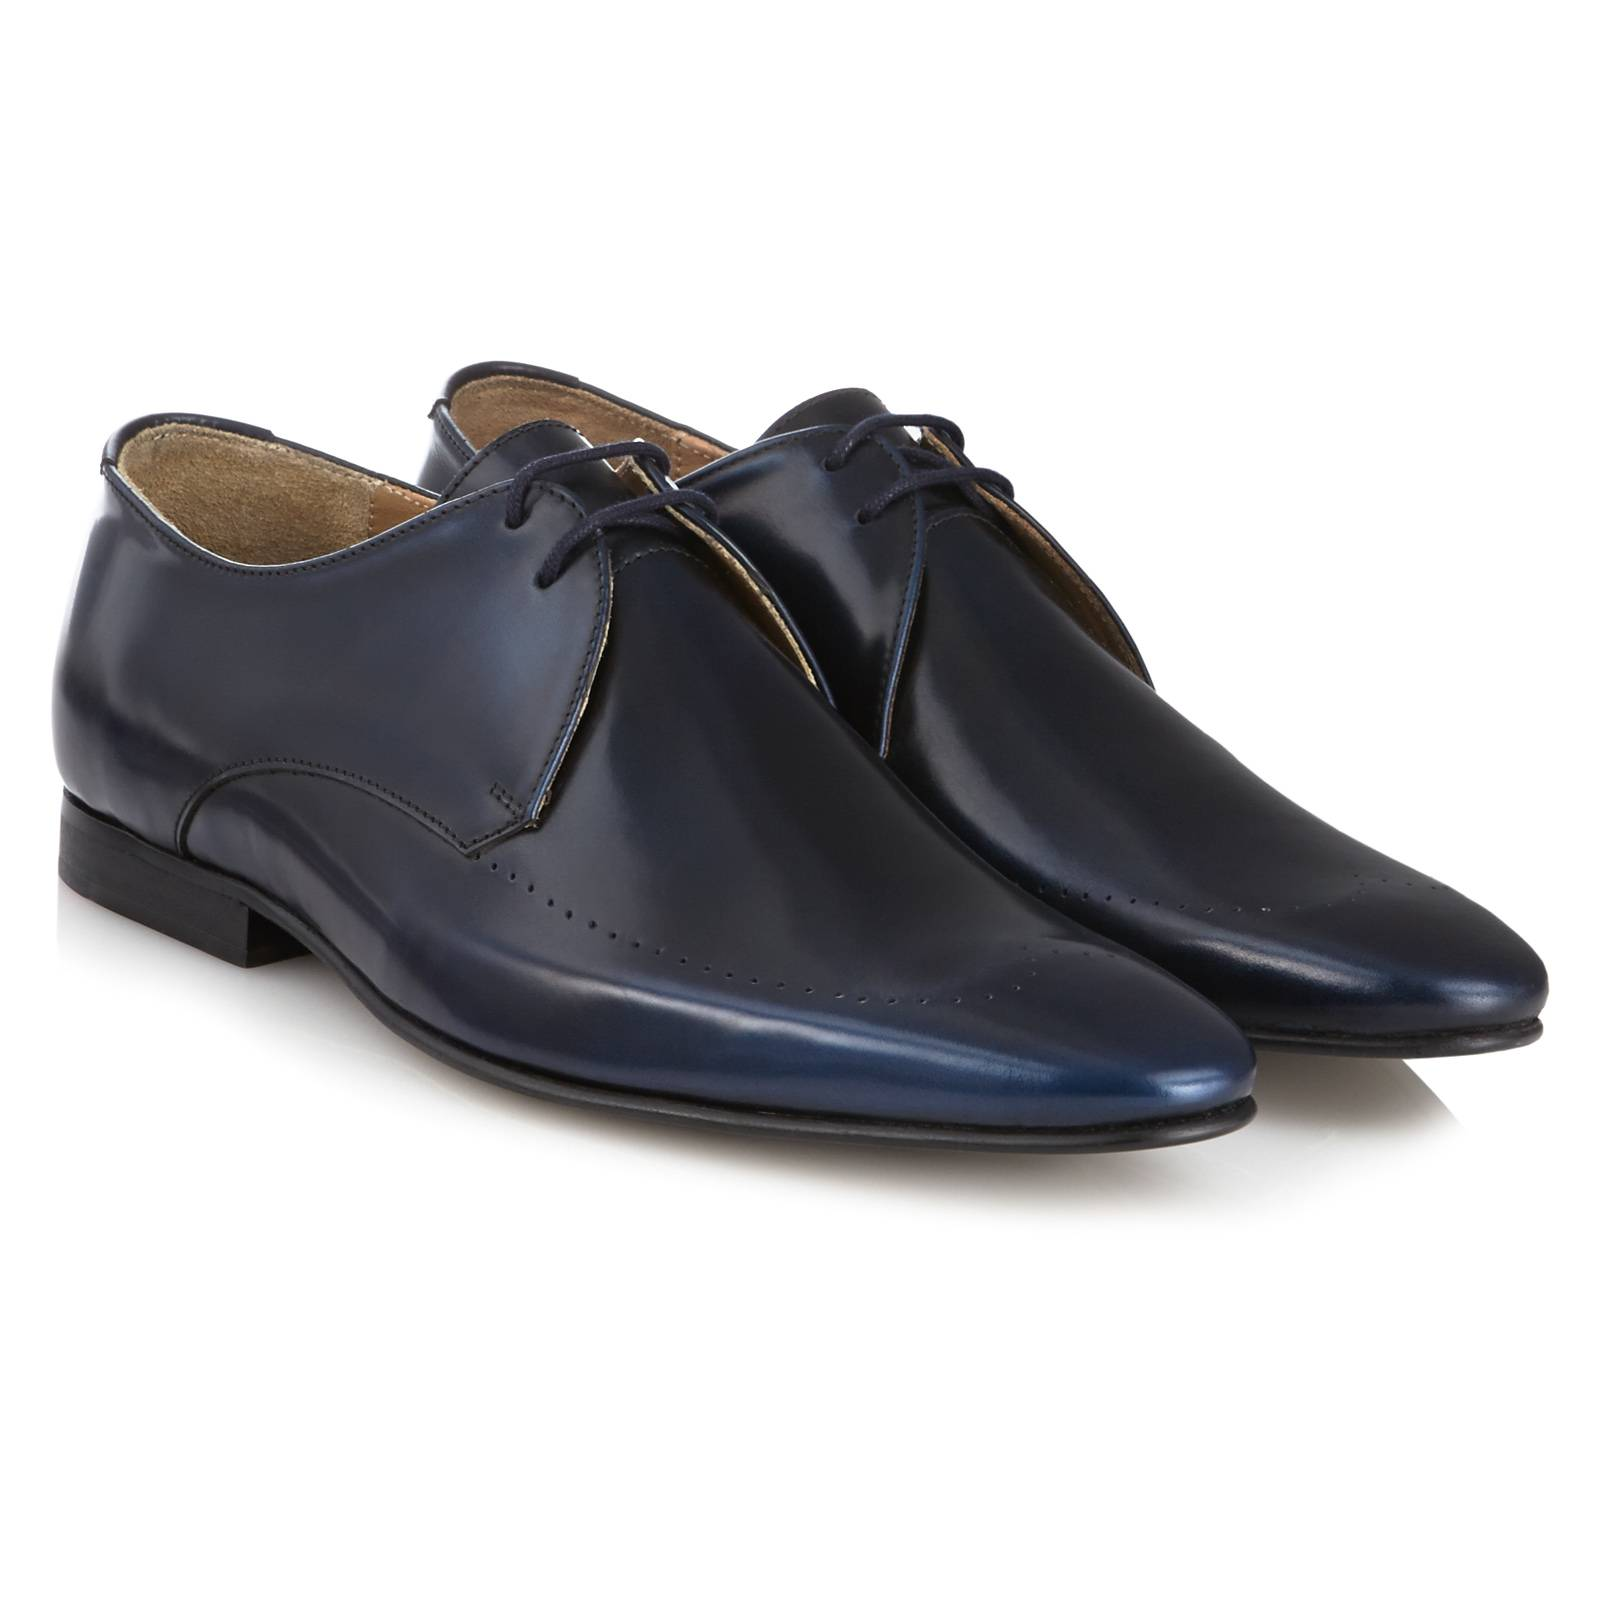 Ботинки Дерби Regent IIОбувь под заказ<br><br><br>Артикул: 0914103<br>Материал: 100% кожа<br>Цвет: темно-синий<br>Пол: Мужской